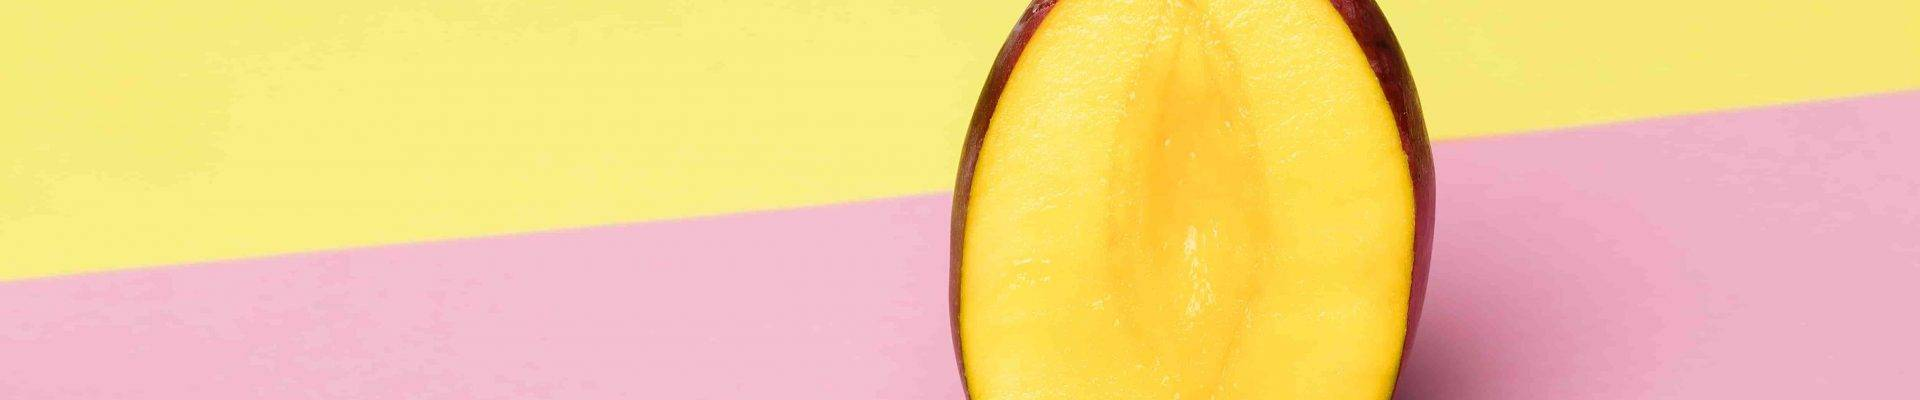 measure influence mango score